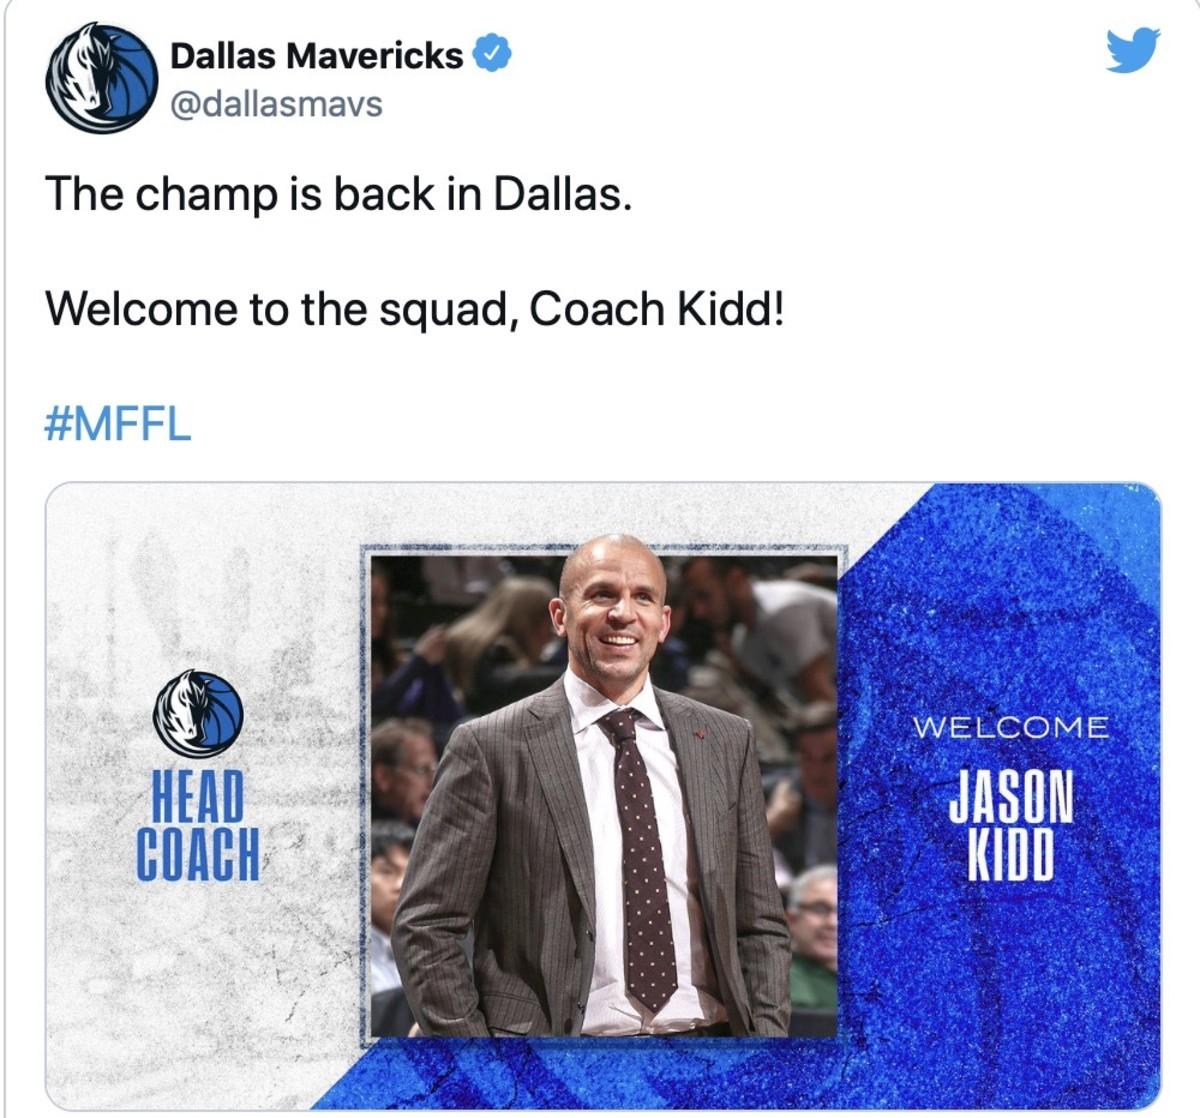 Mavericks welcome Jason Kidd